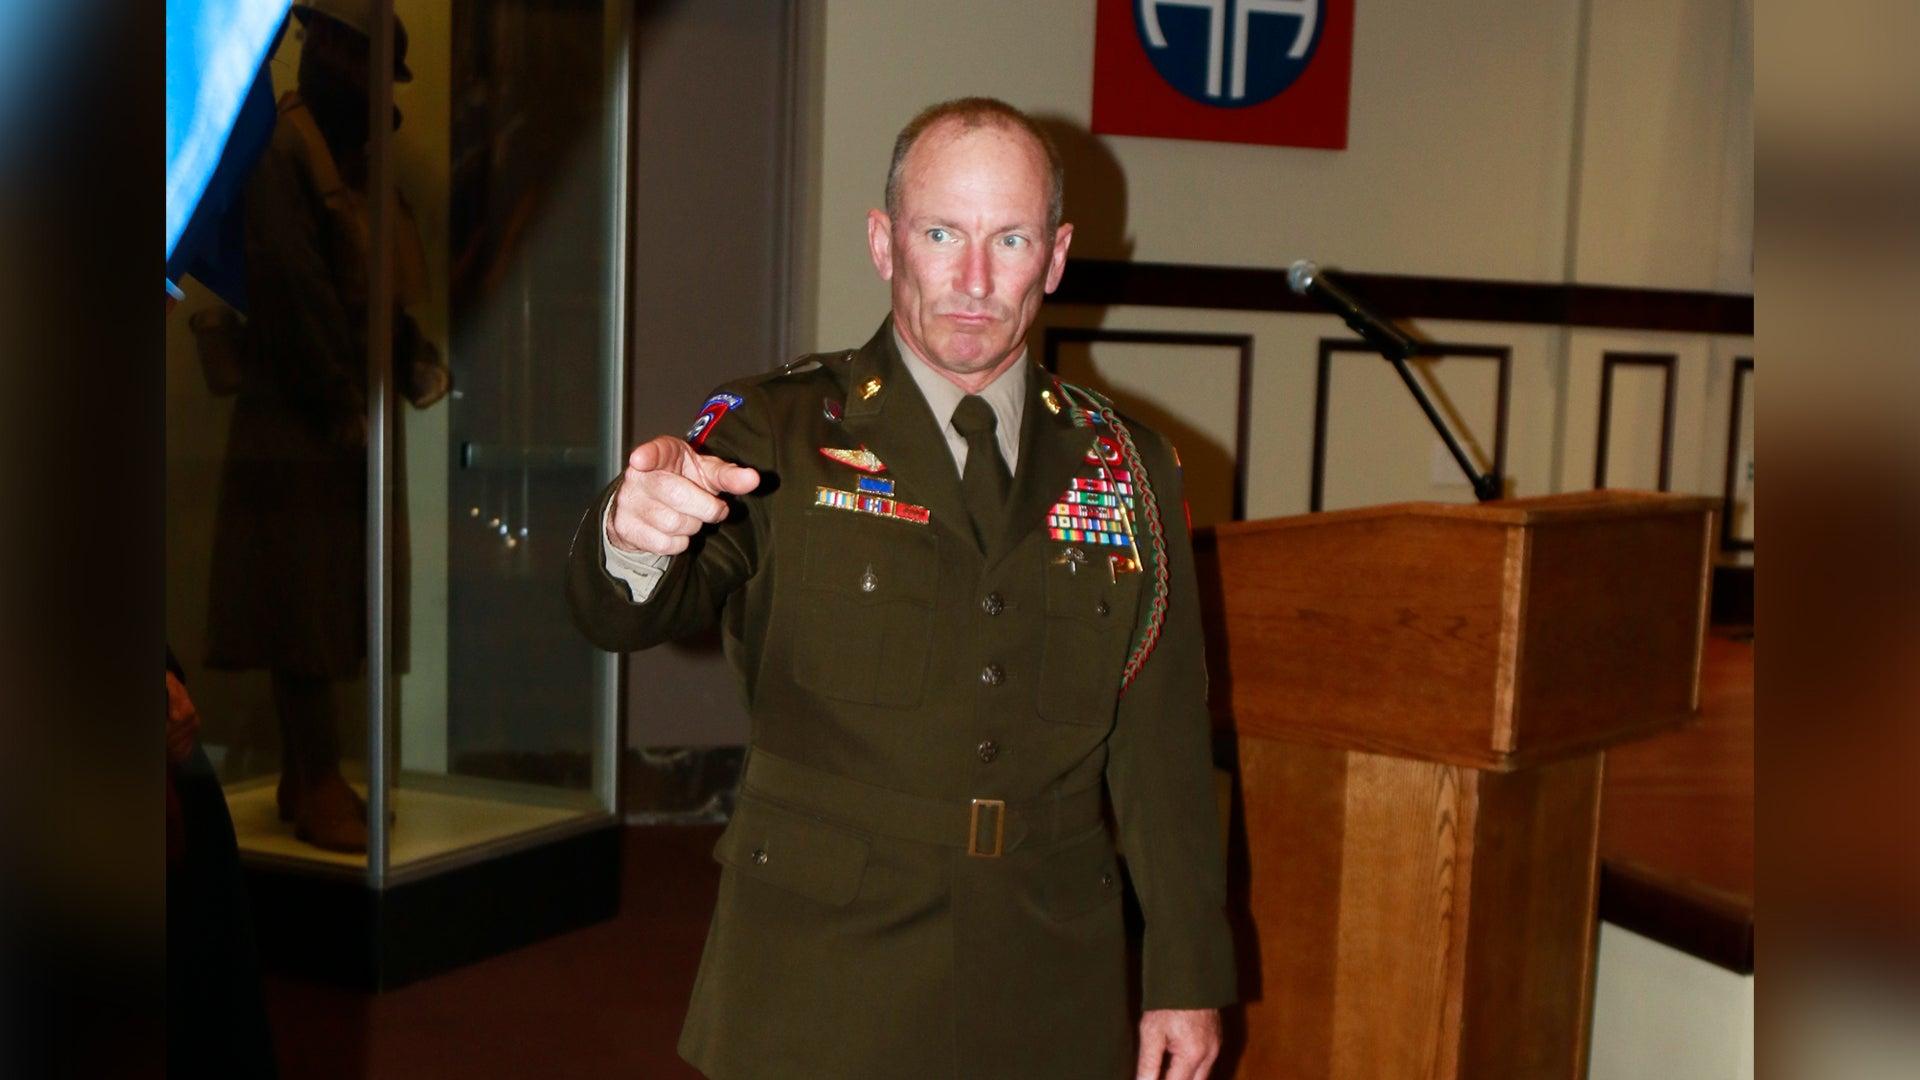 Fort Hood command sergeant major suspended over 'unprofessional language'